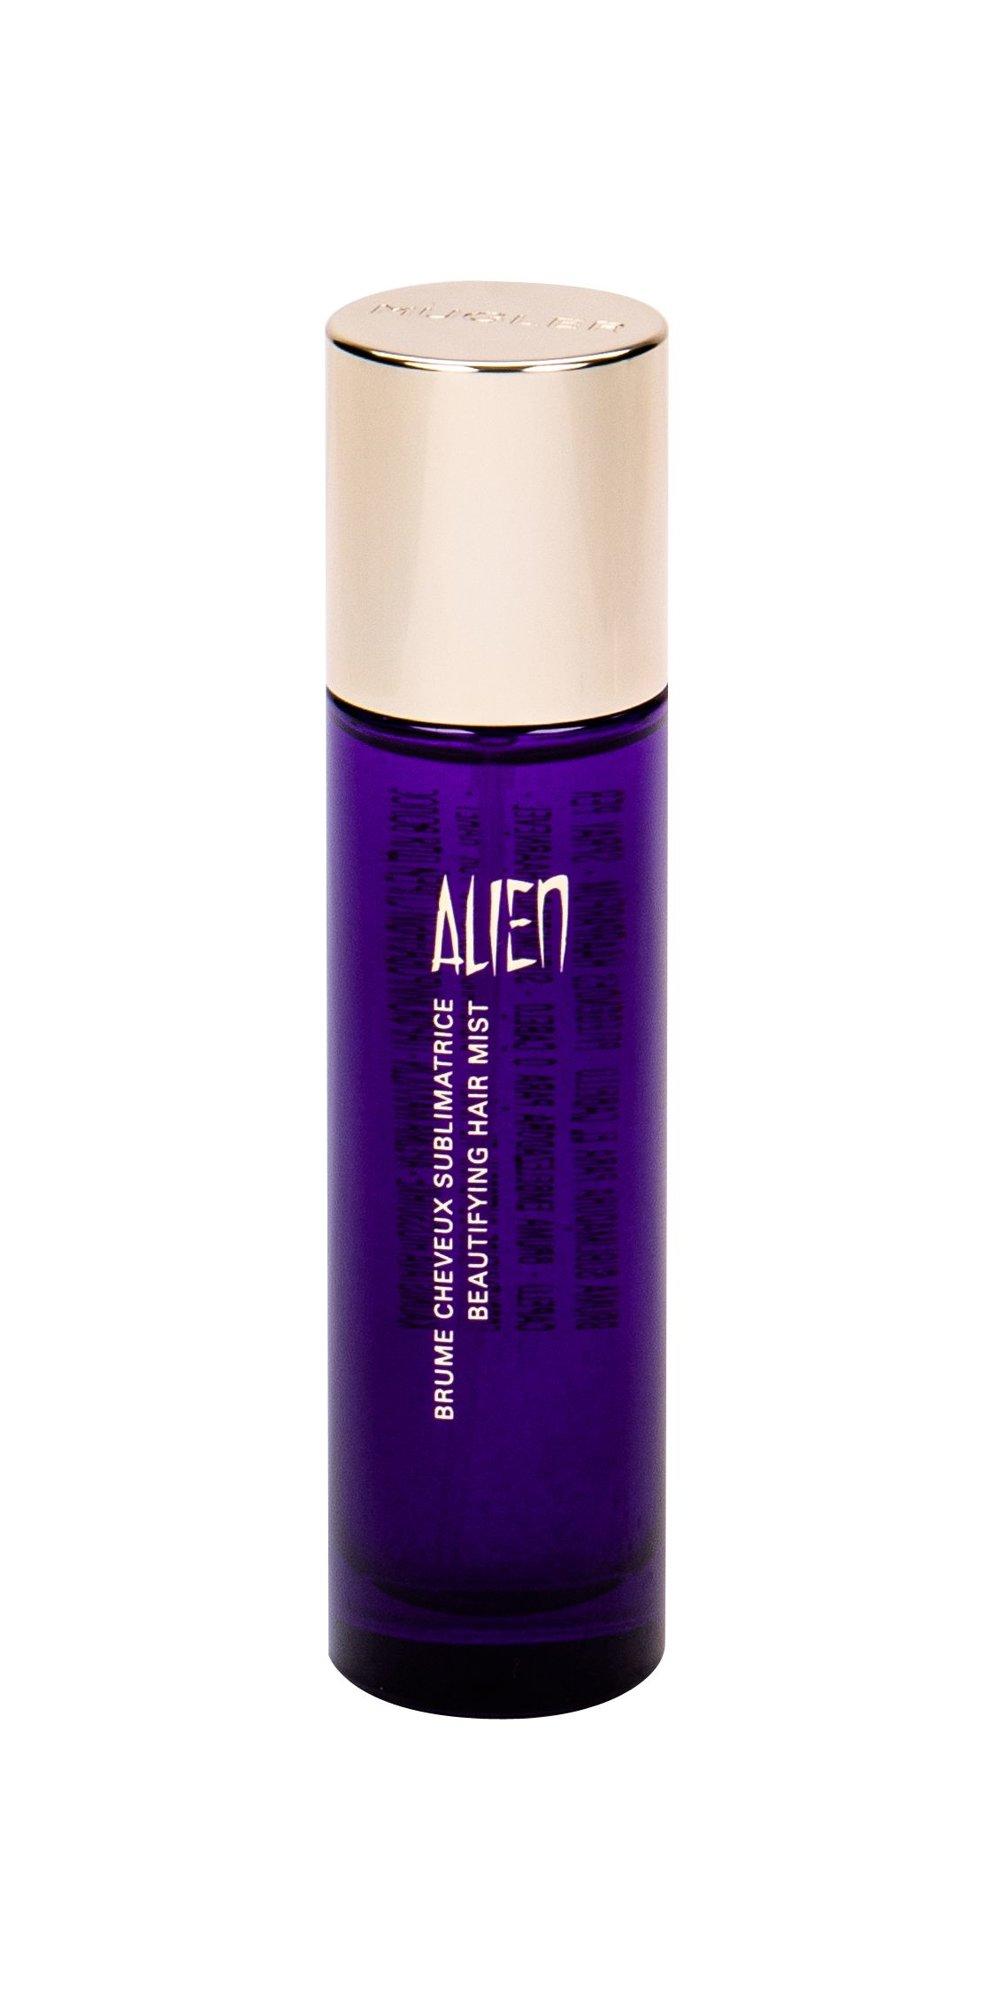 Thierry Mugler Alien Hair Mist 30ml